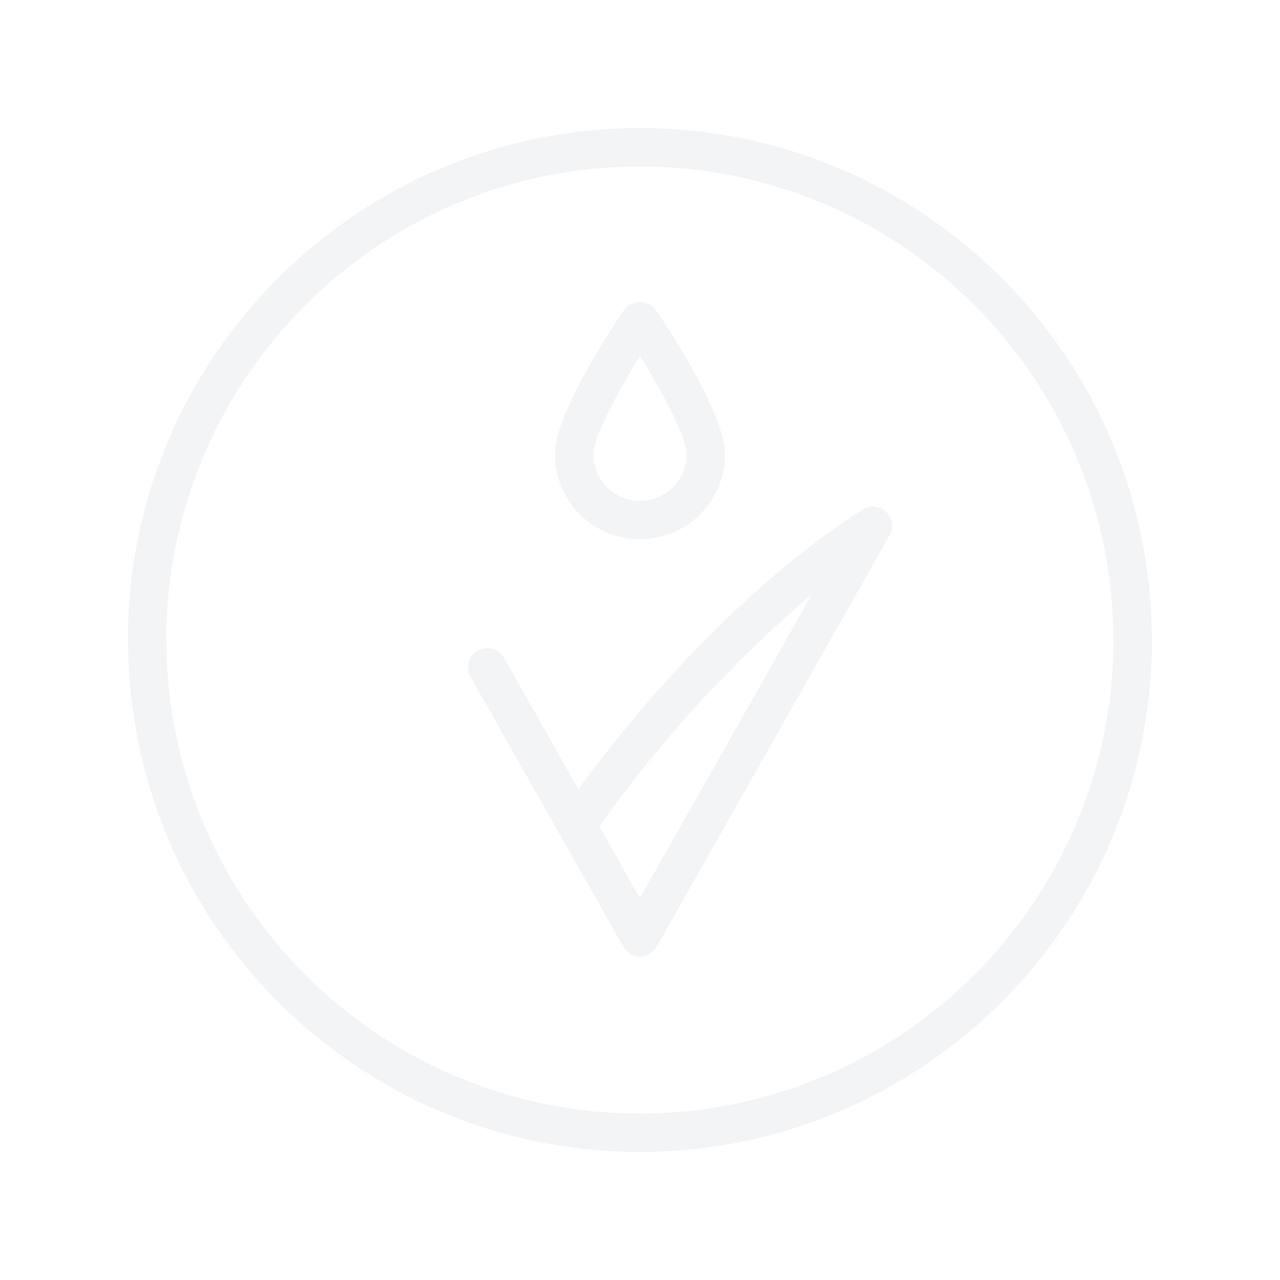 Clarins Skin Illusion Loose Powder Foundation With Brush 13g